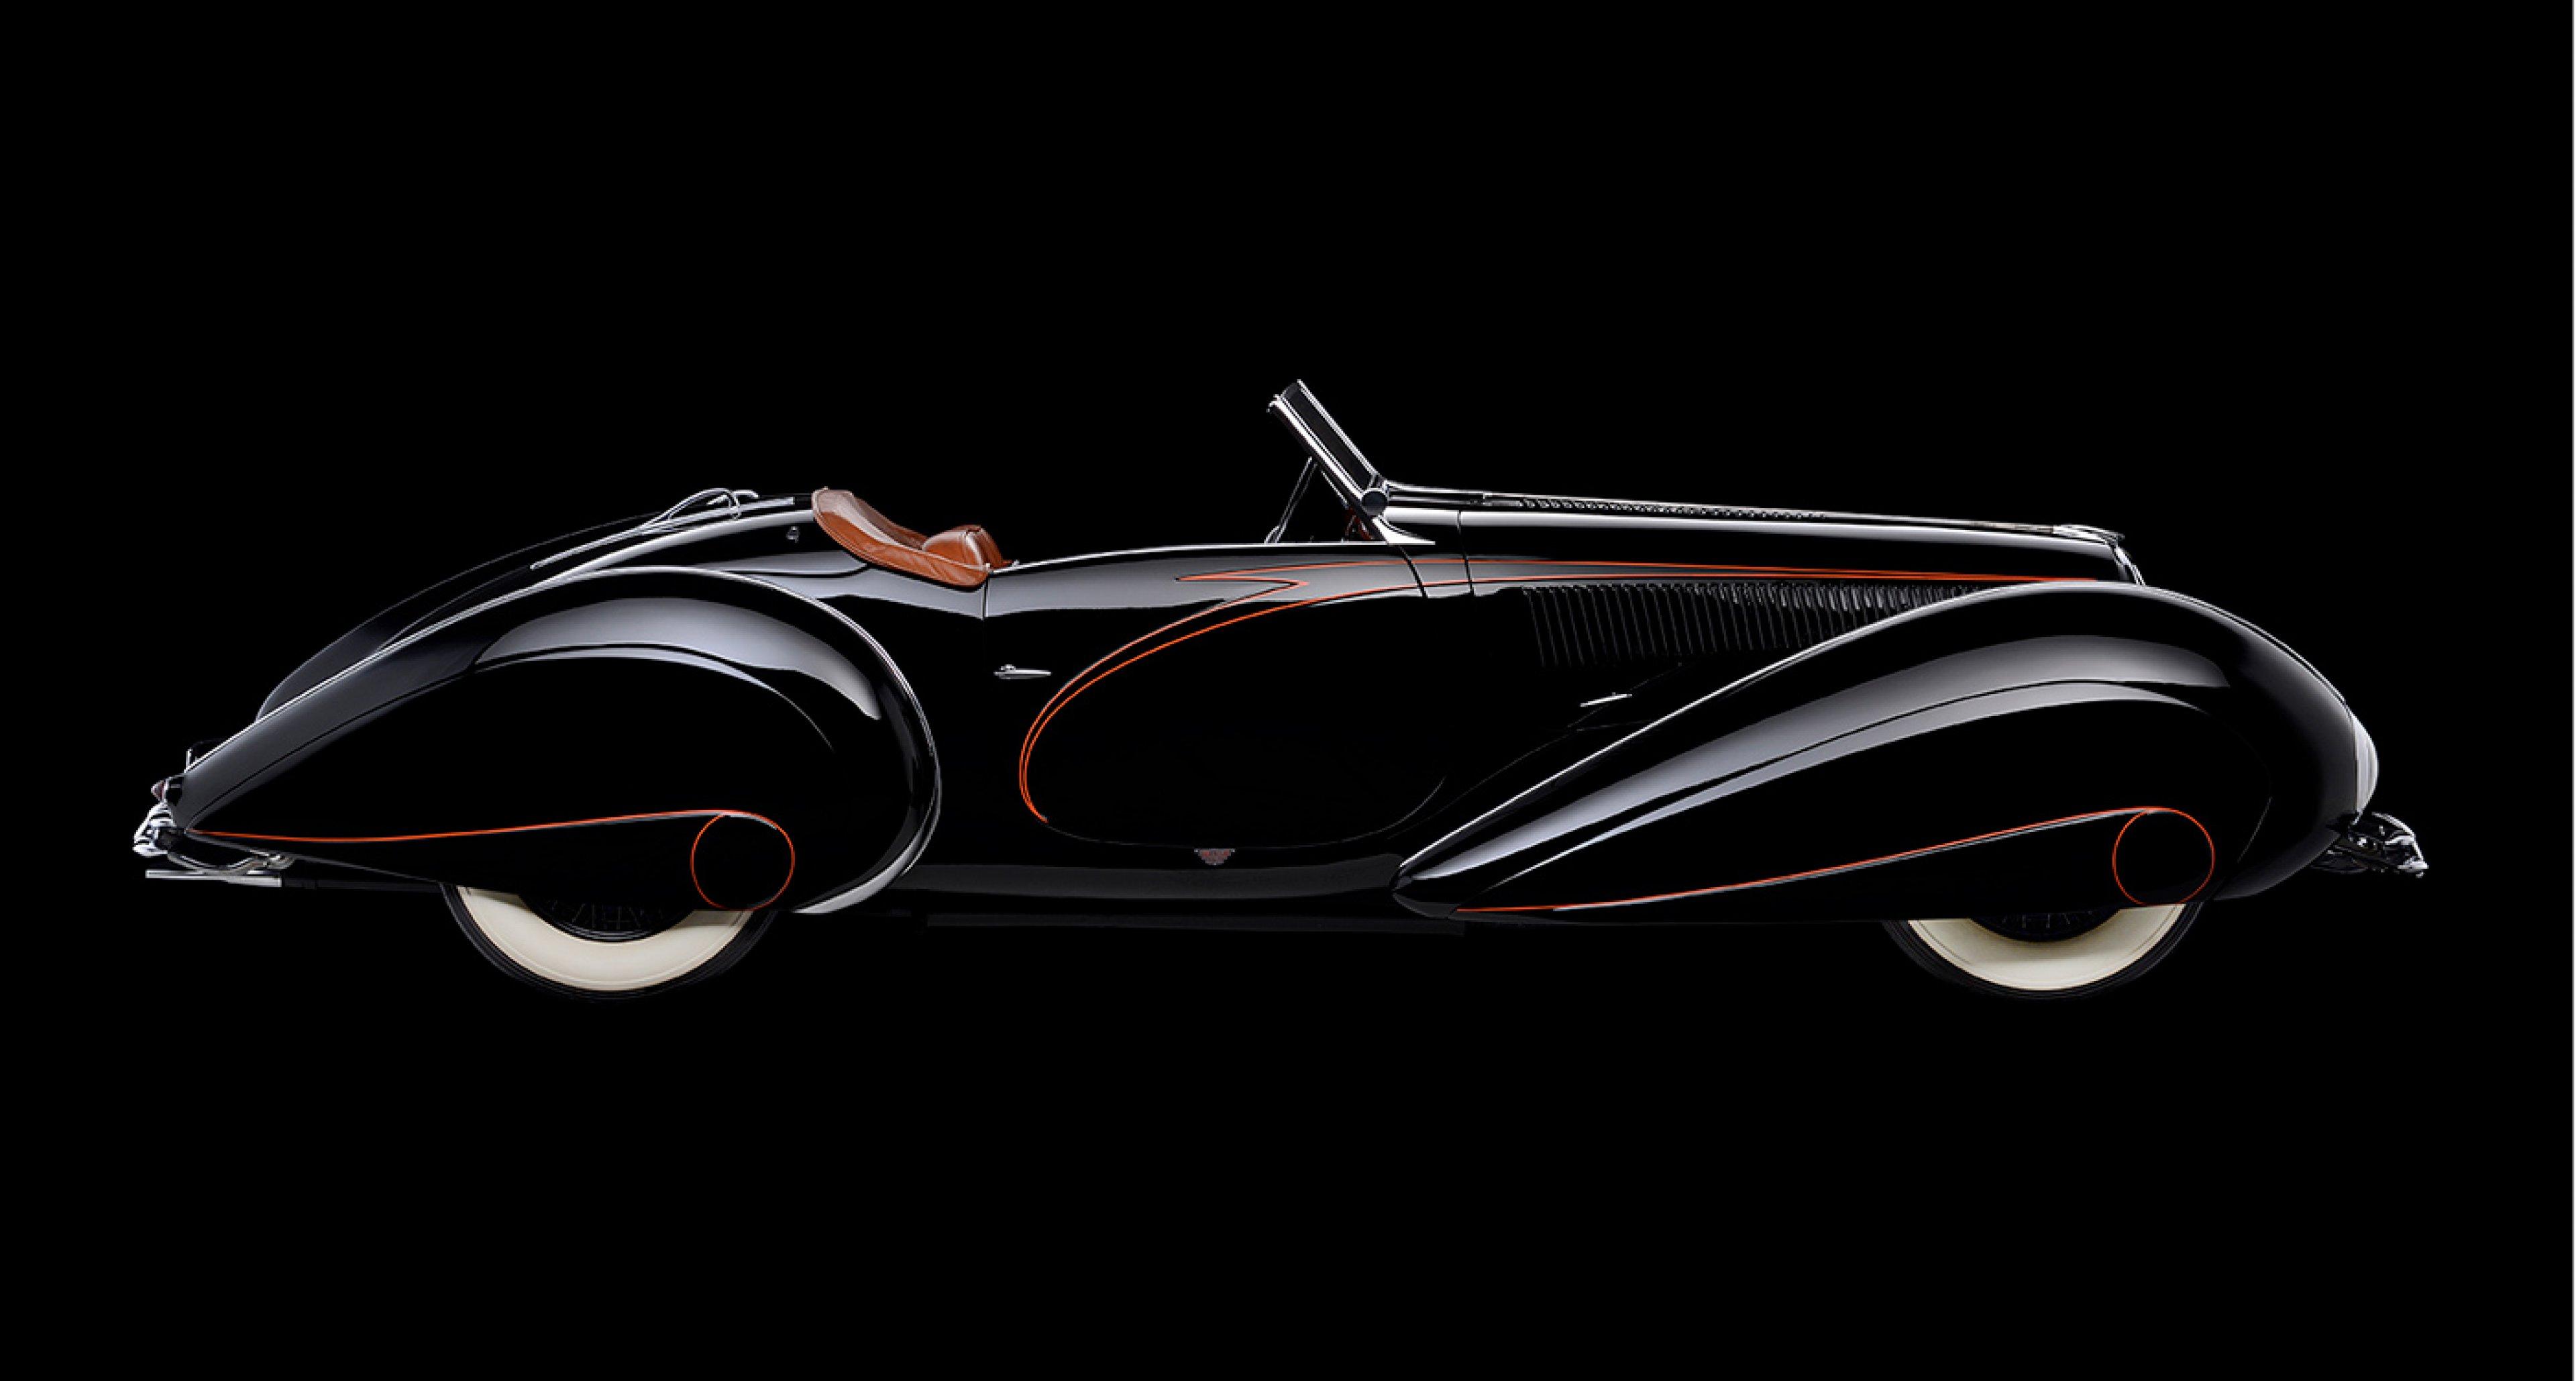 Delahaye 135MS Figoni Roadster, 1937, Collection of Margie and Robert E. Petersen; Photo © 2016 Scott Williamson, Photodesign Studios